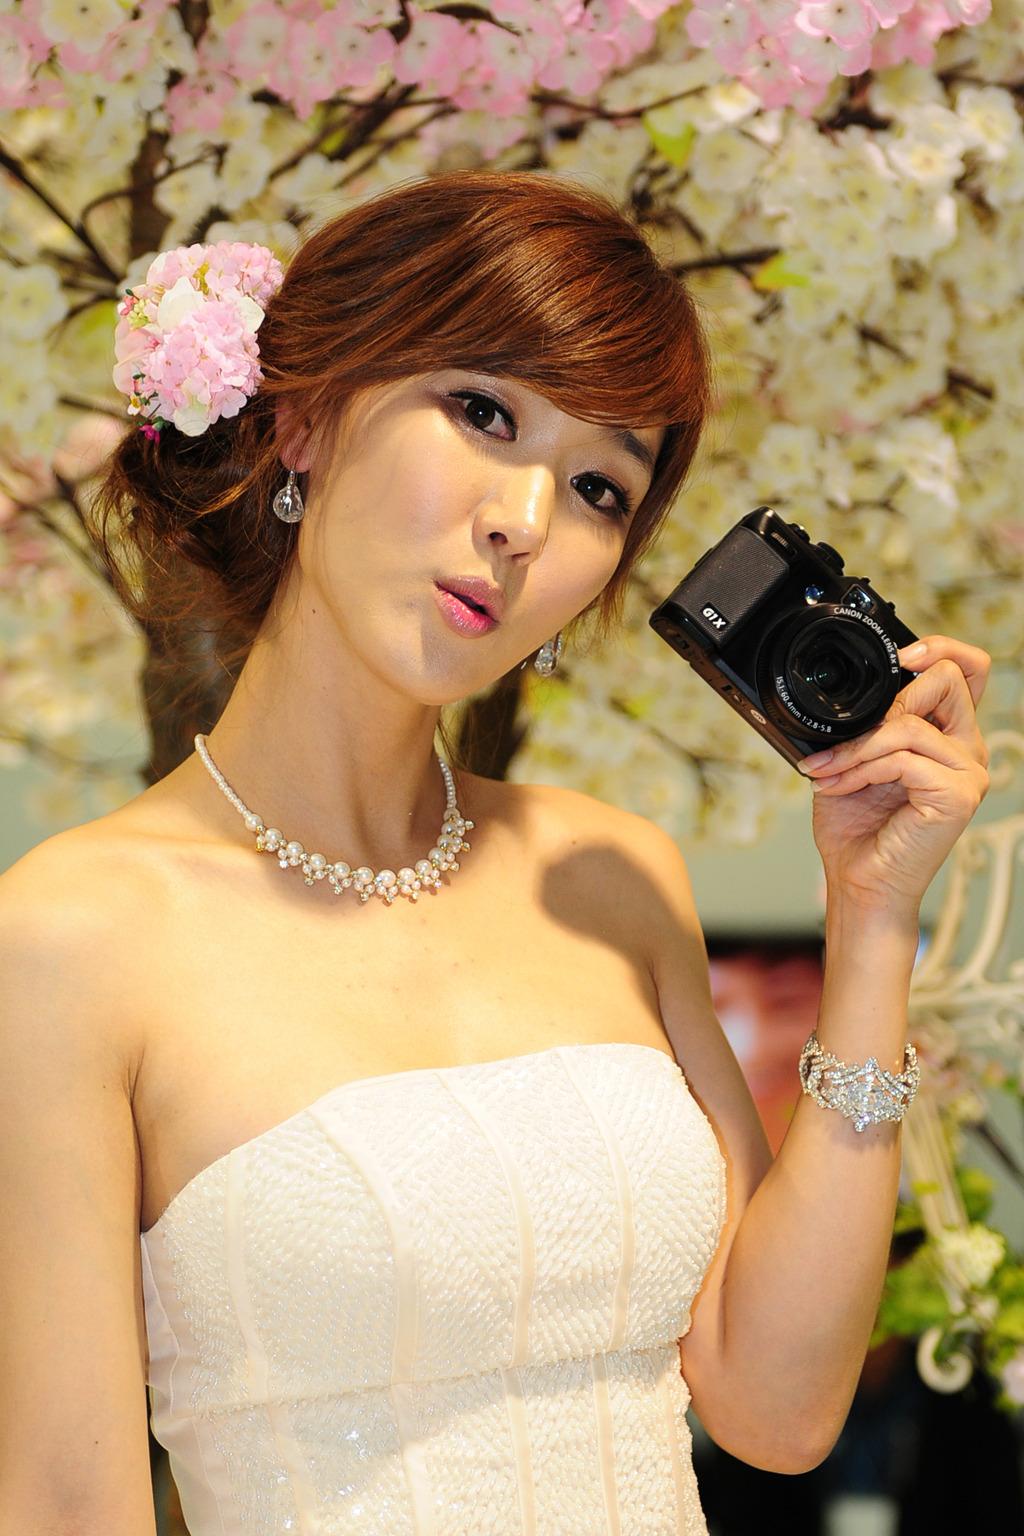 xxx nude girls: Lee Yoo Eun - Dungeon & Fighter 2012